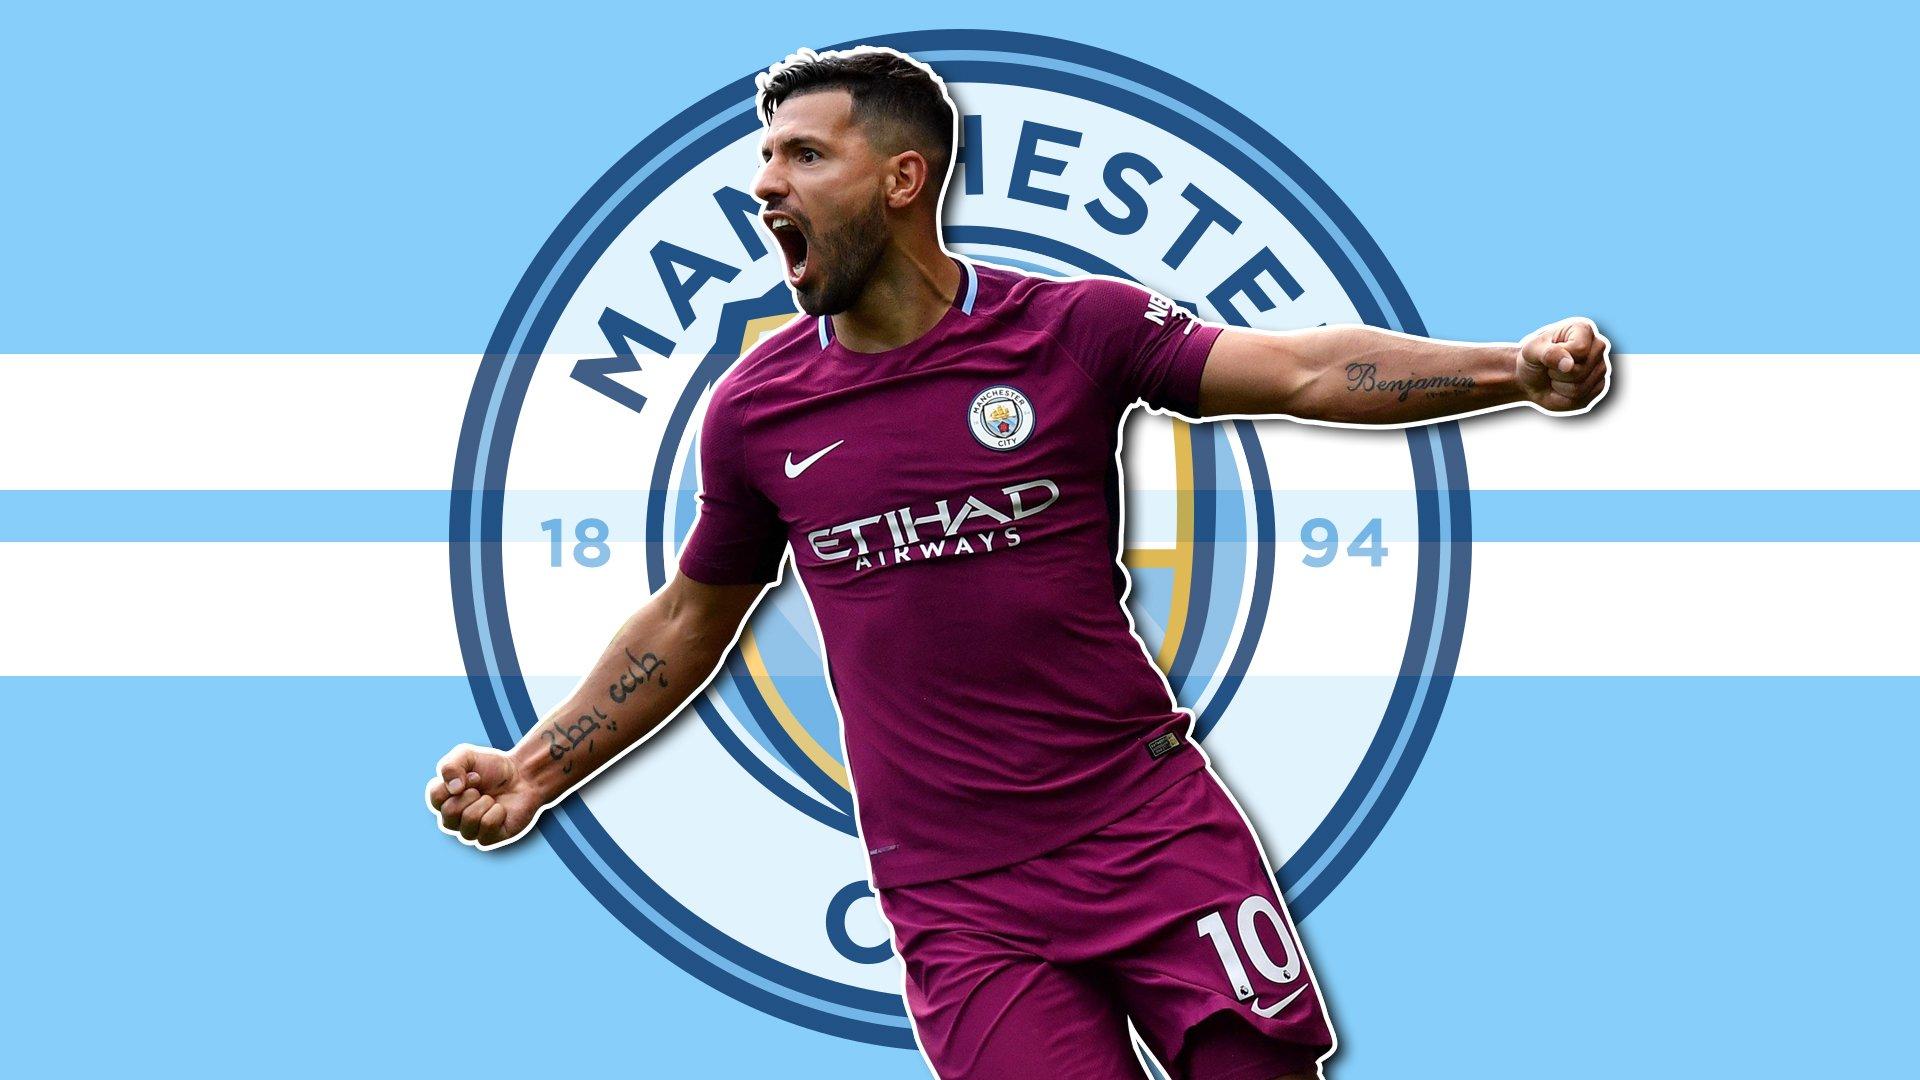 Agüero Wallpapers: Manchester City - Sergio Aguero HD Wallpaper